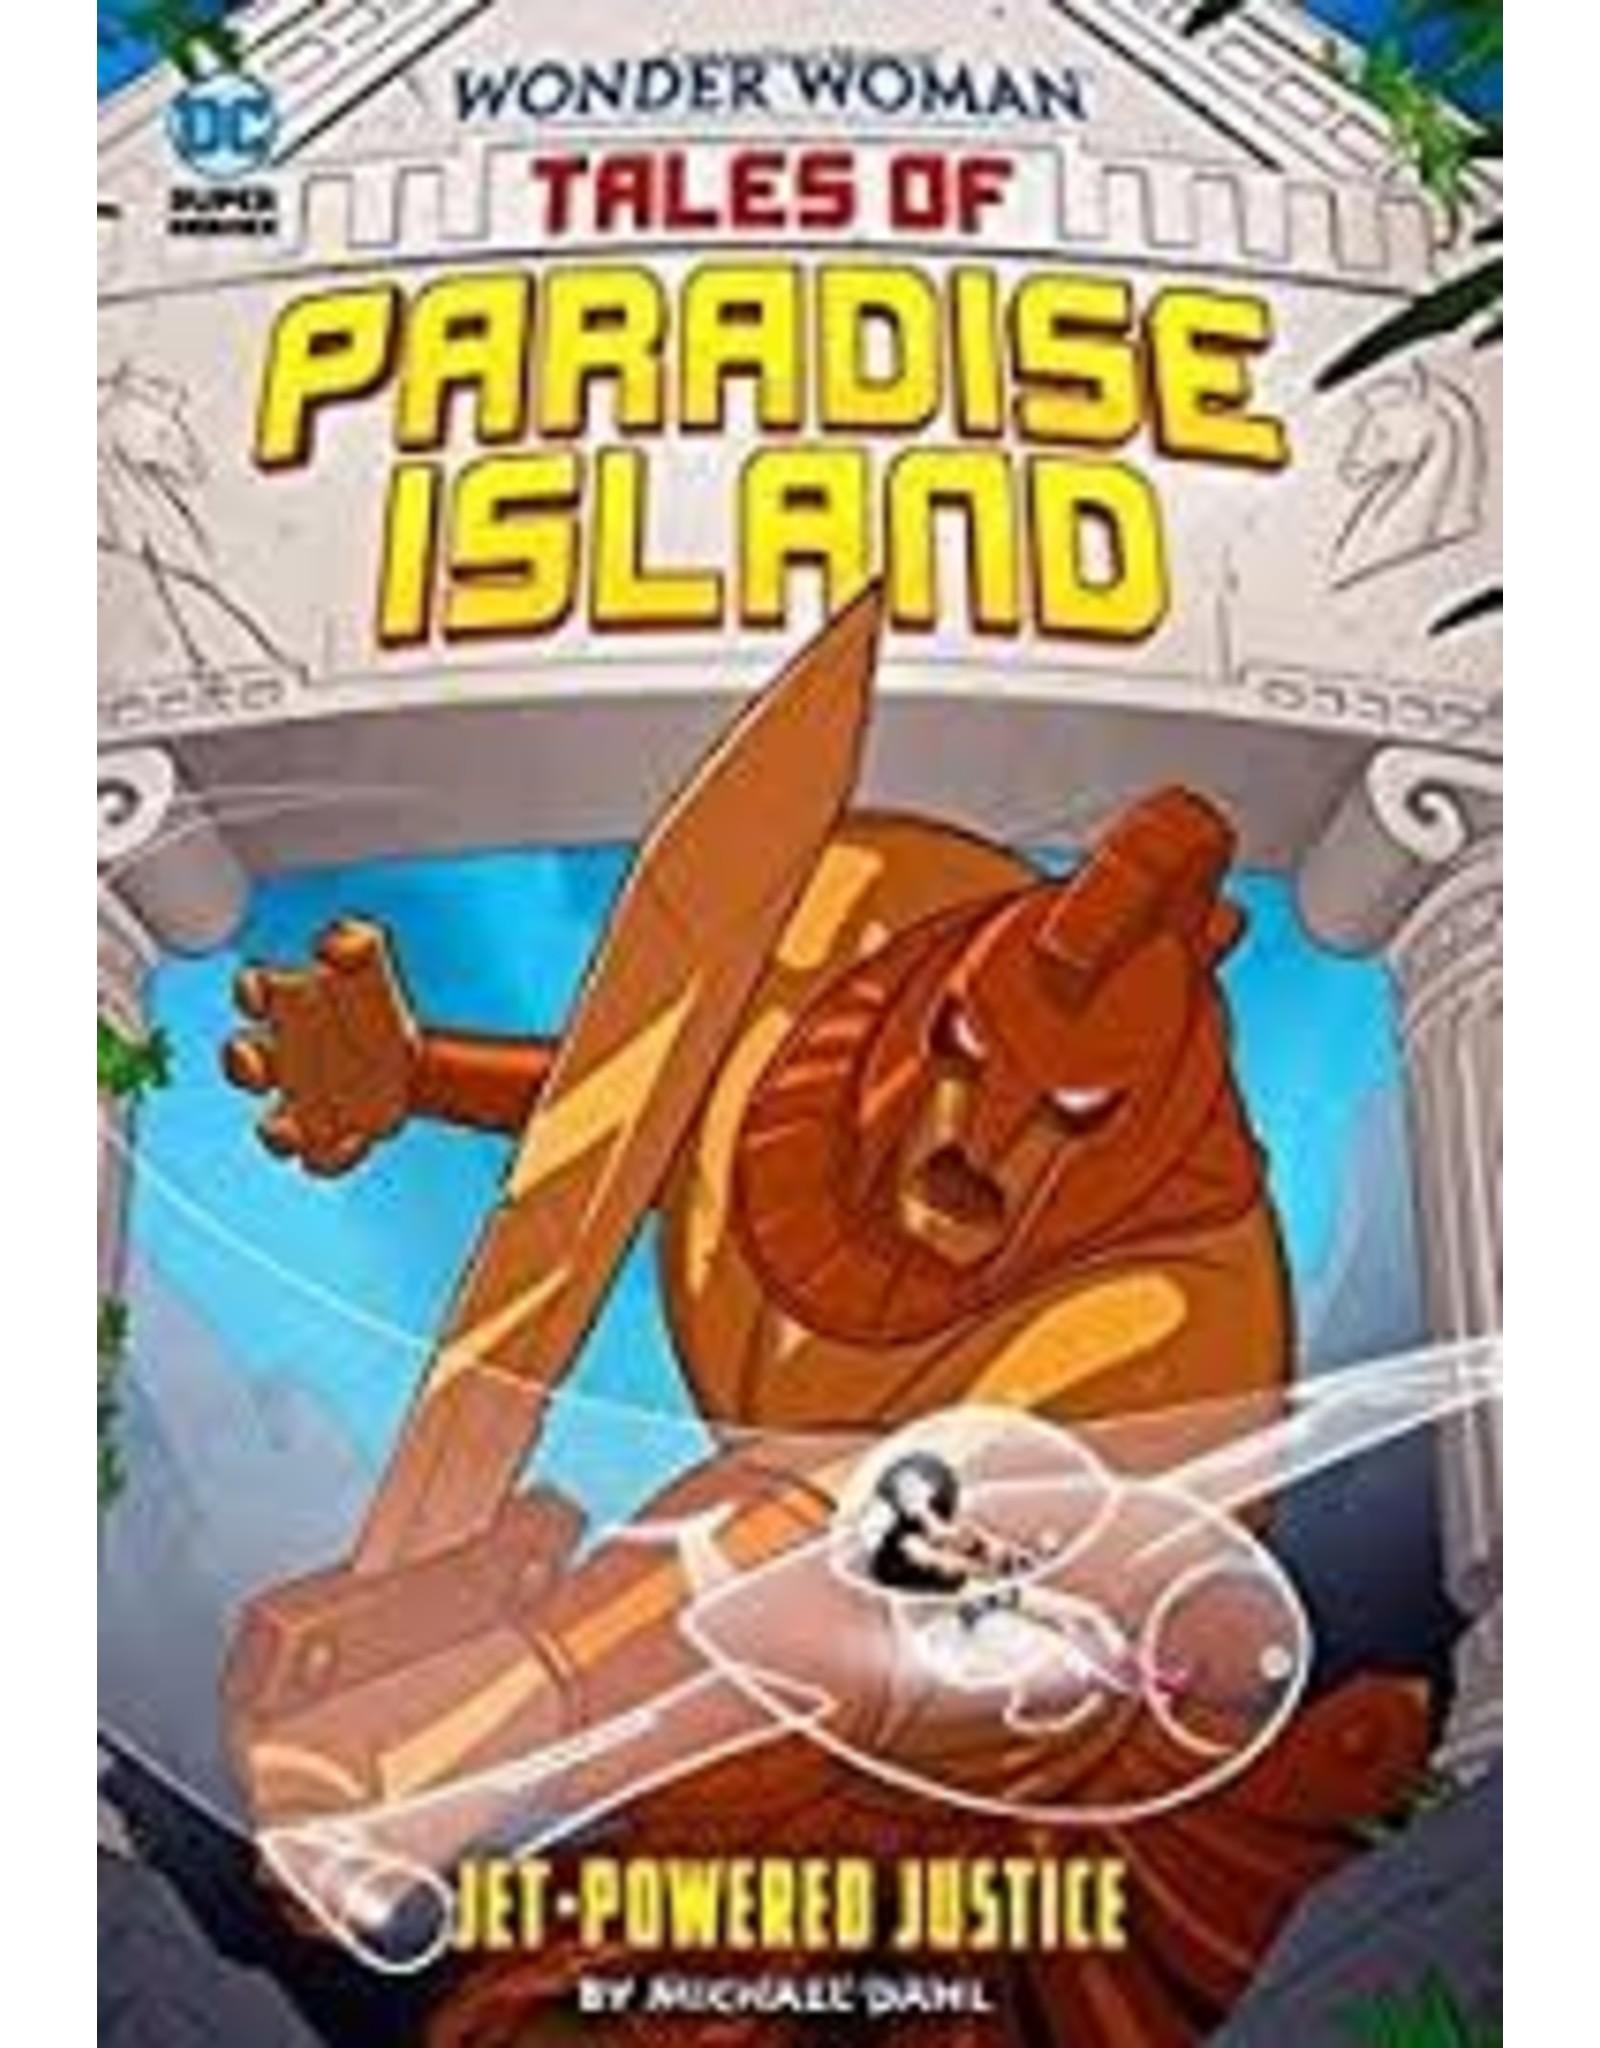 CAPSTONE PRESS WW PARADISE ISLAND YR TP JET POWERED JUSTICE